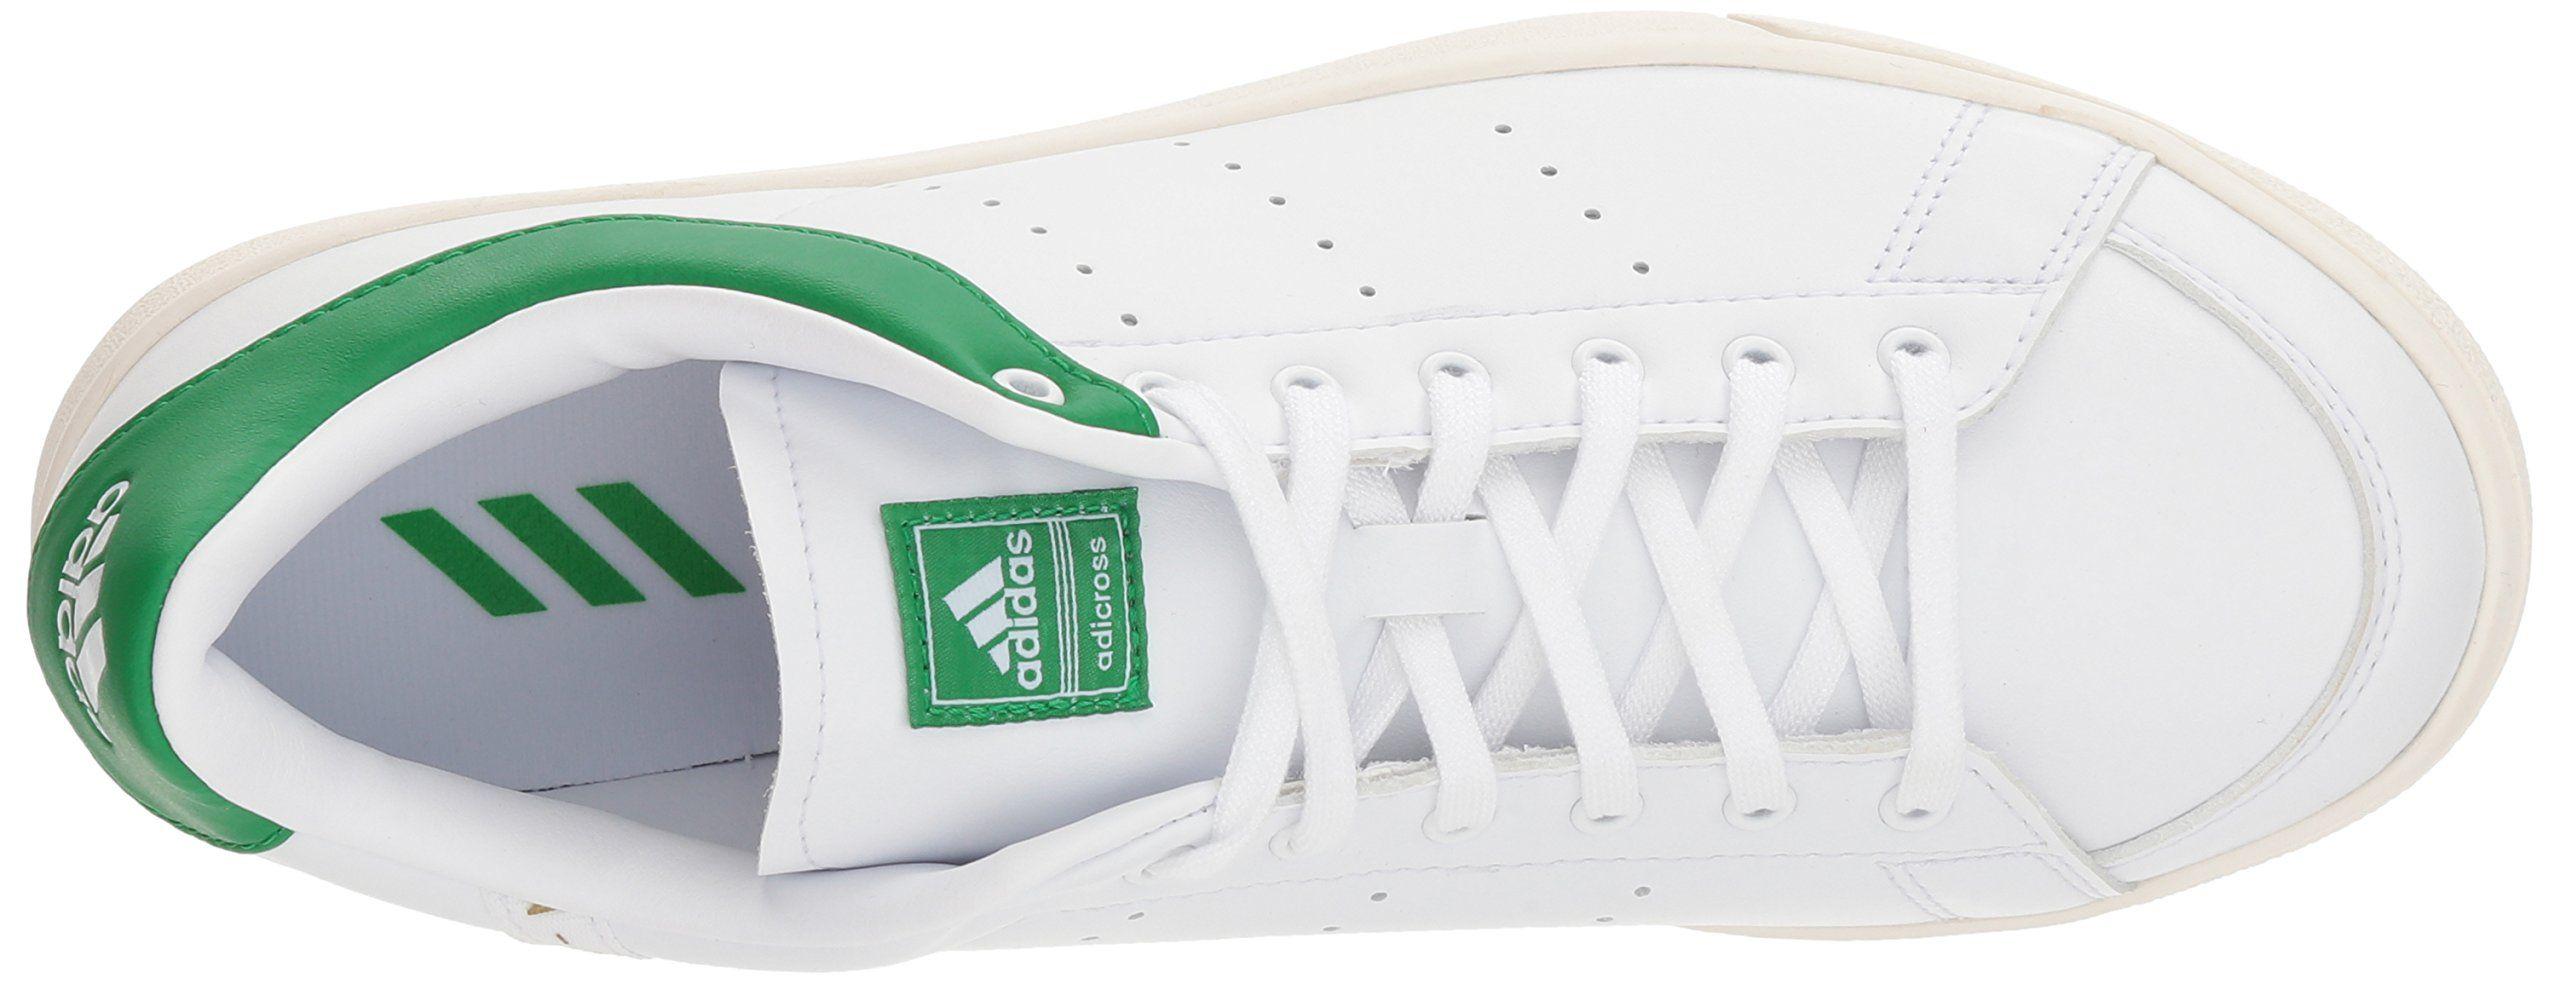 Excéntrico apoyo modo  adidas UnisexKids Jr. Adicross Classic Golf Shoe Ftwr White/Ftwr White/Green  5 Medium US Little Kid * You can find mo…   Classic golf, Golf shoes, Adidas  kids shoes